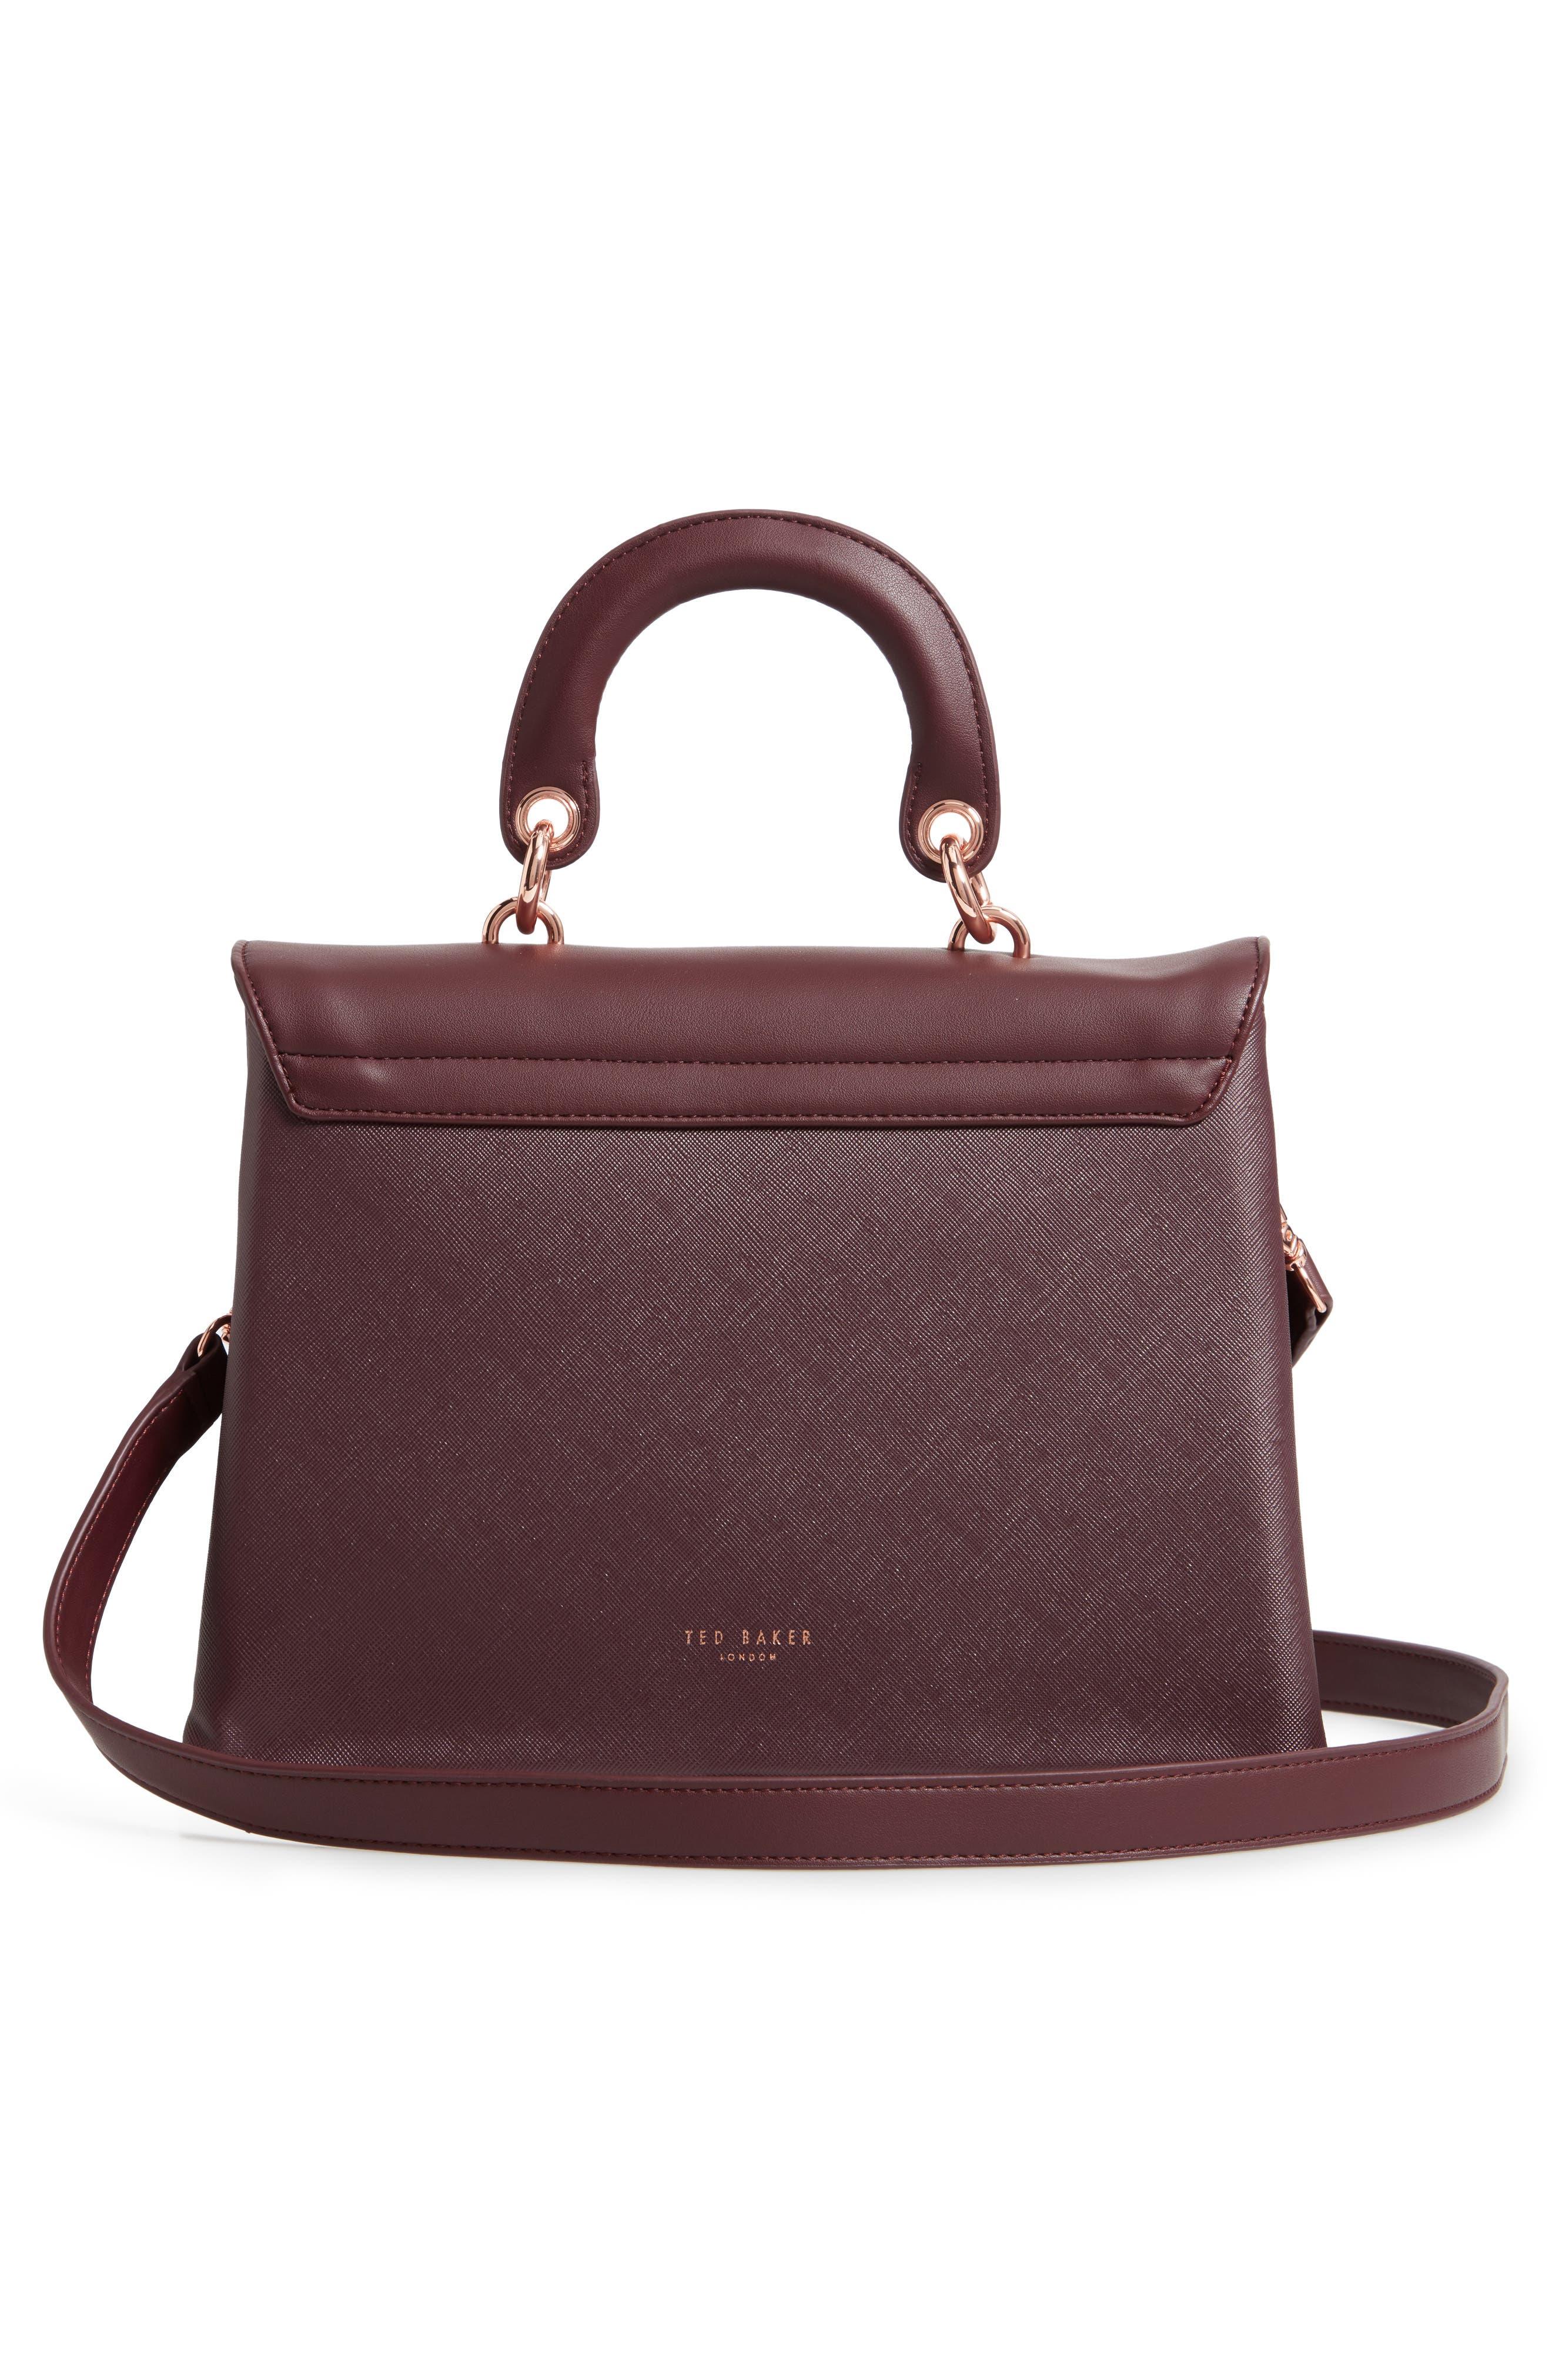 Keiira Lady Bag Faux Leather Top Handle Satchel,                             Alternate thumbnail 3, color,                             DEEP PURPLE